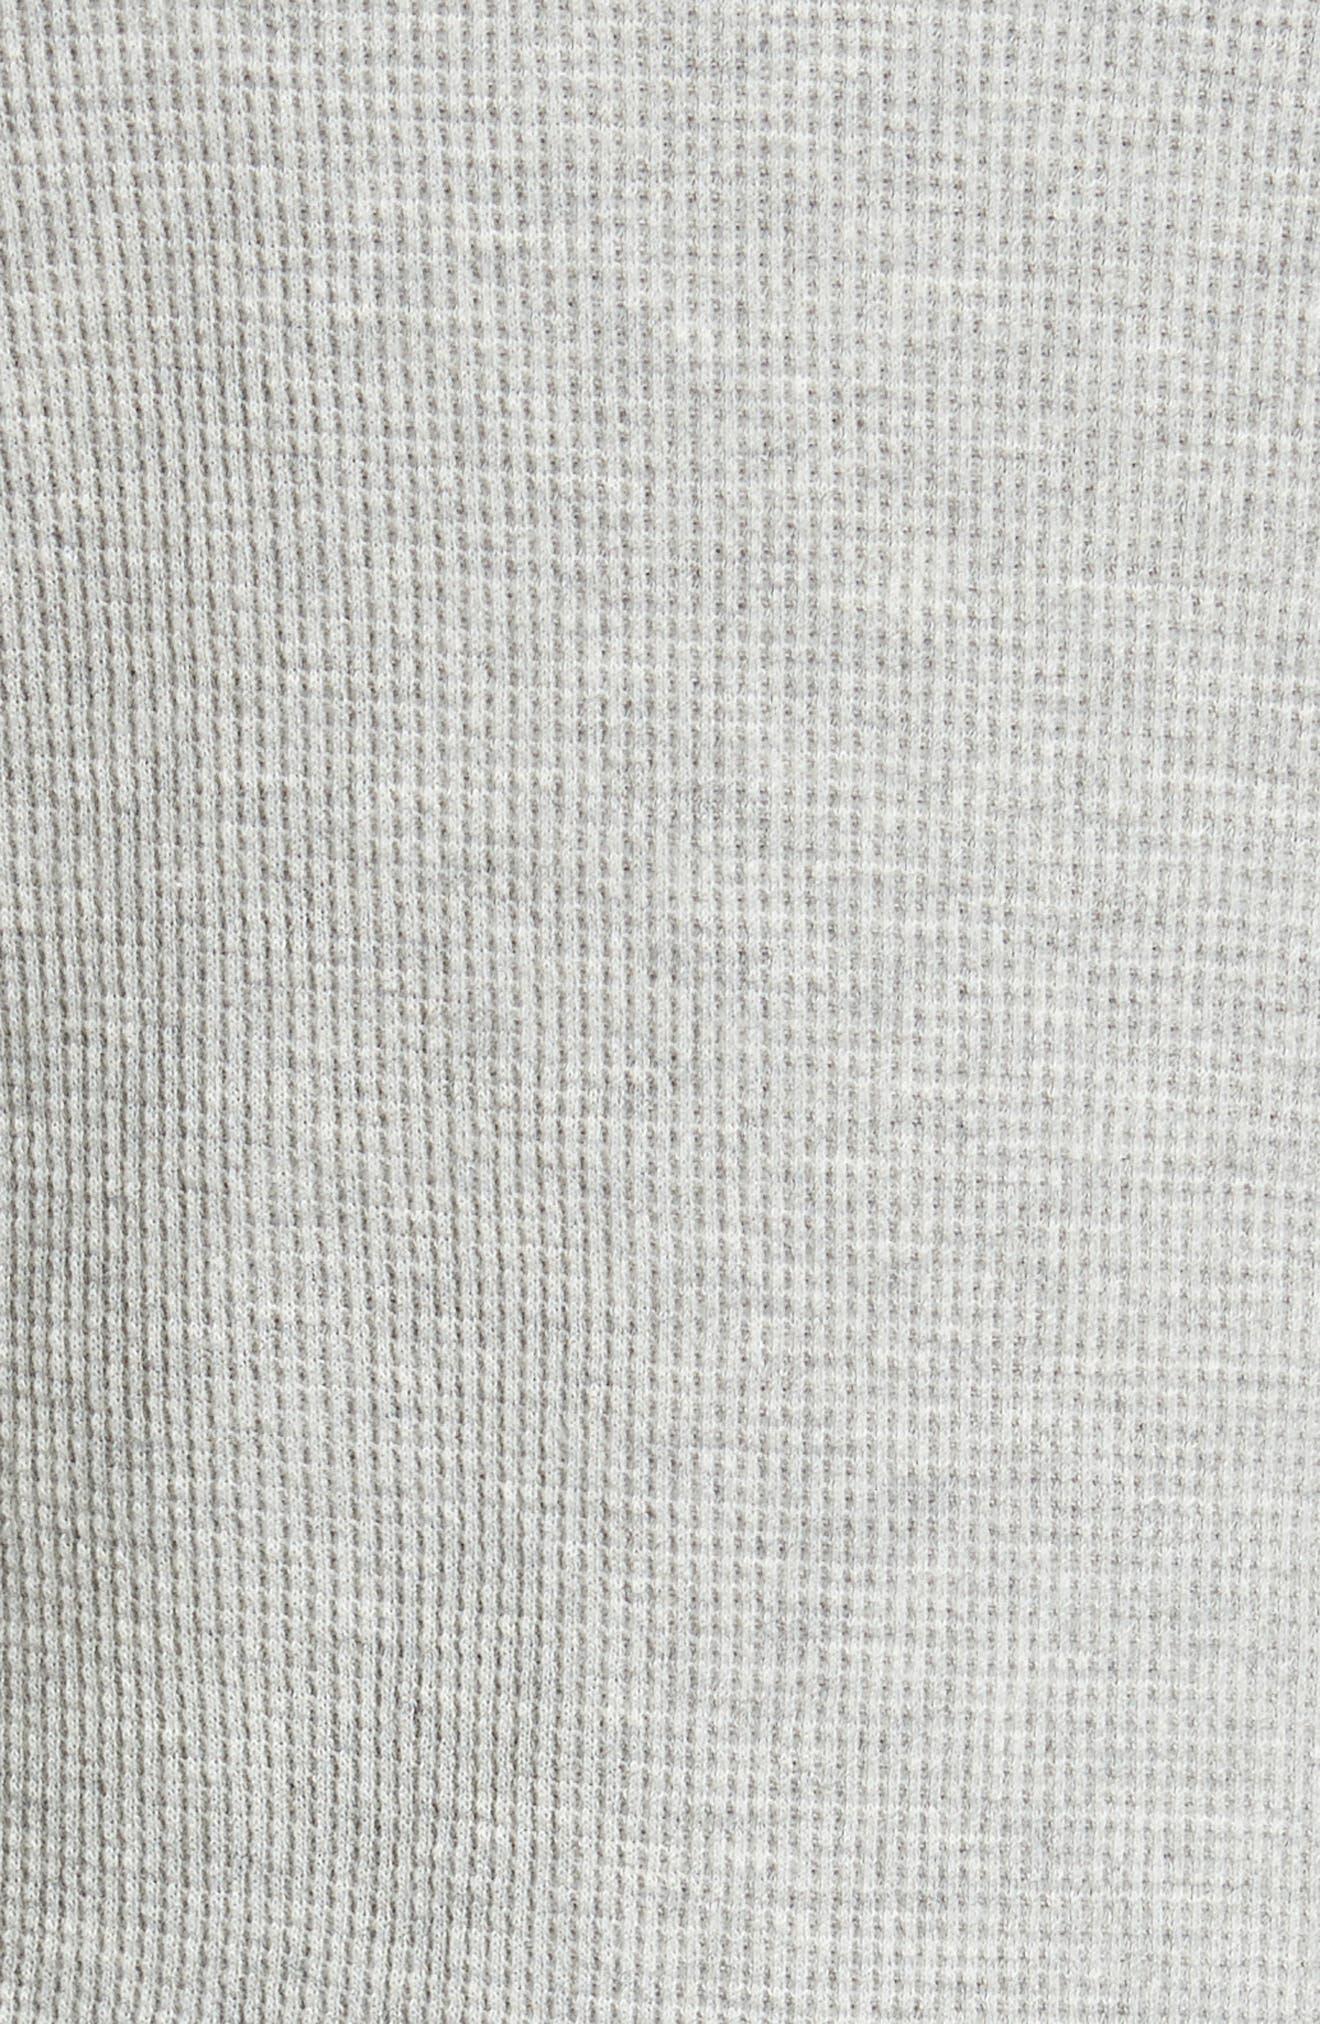 Thermal Pima Cotton Tee,                             Alternate thumbnail 5, color,                             061